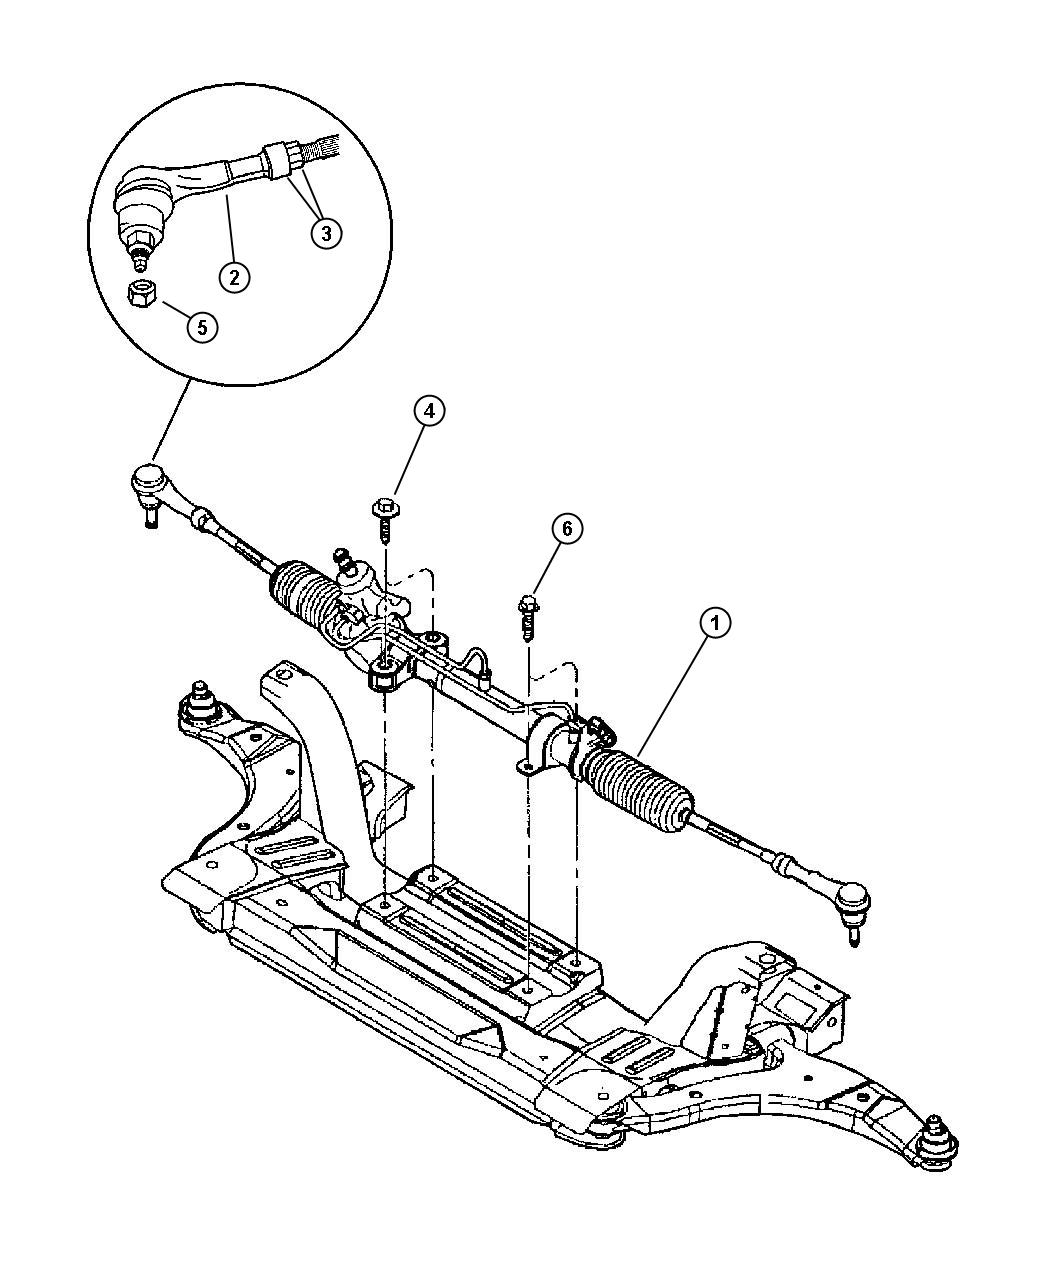 2001 Dodge Neon Gear. Power steering. Sba, rack, pinion